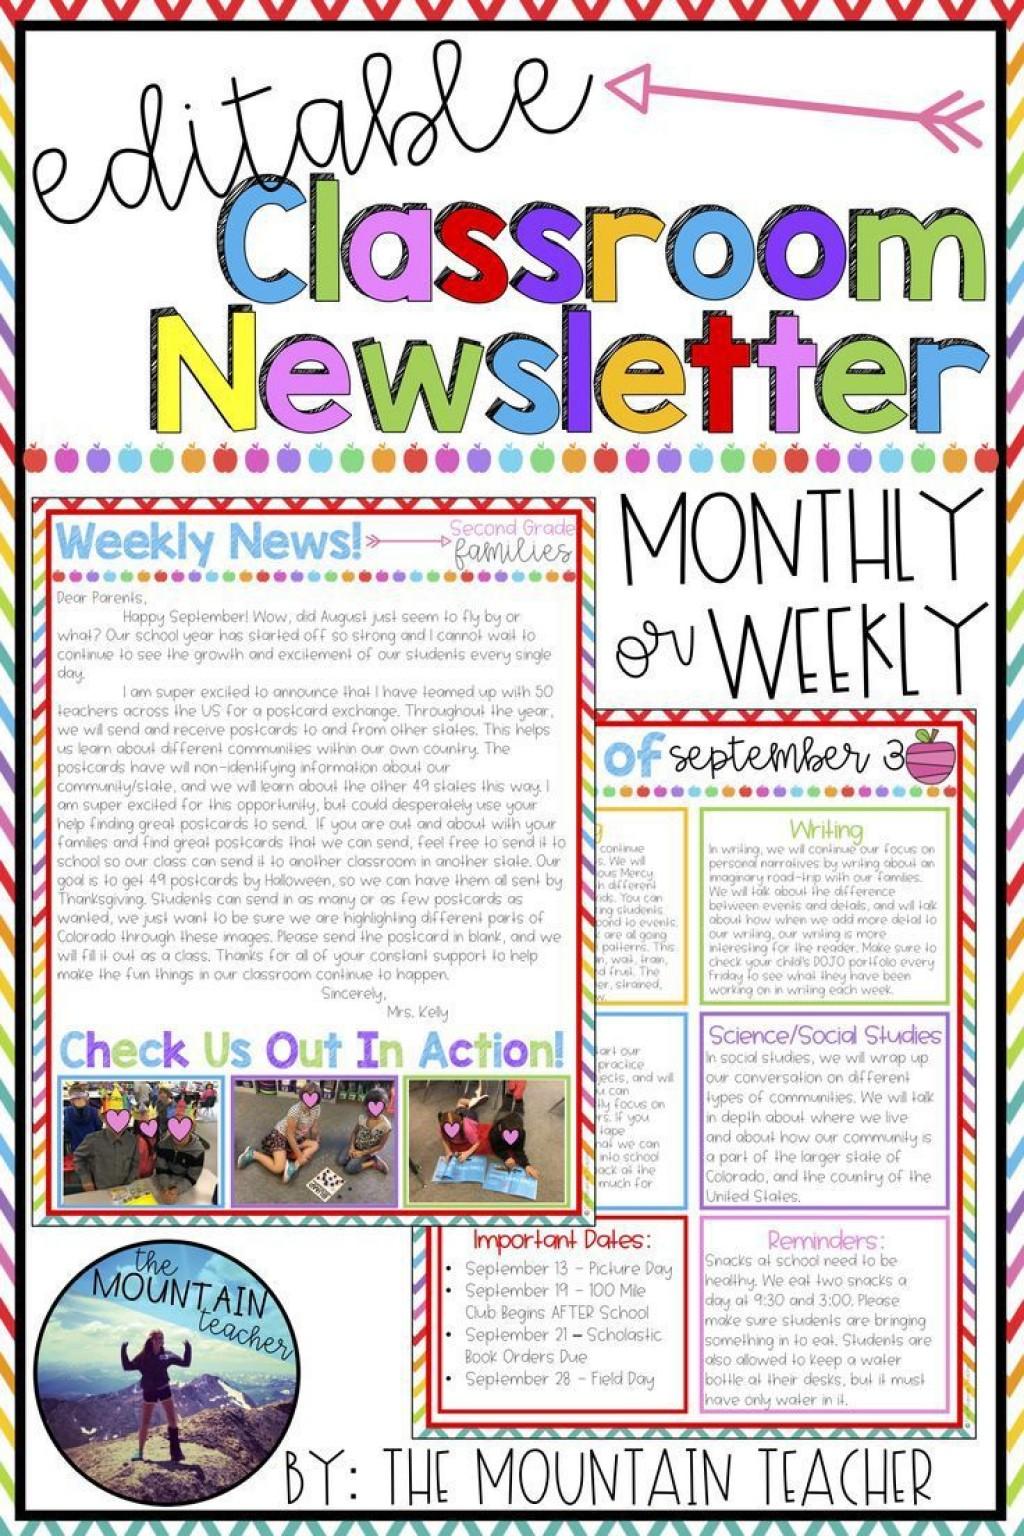 002 Simple Elementary School Newsletter Template Inspiration  Clas Teacher Free CounselorLarge